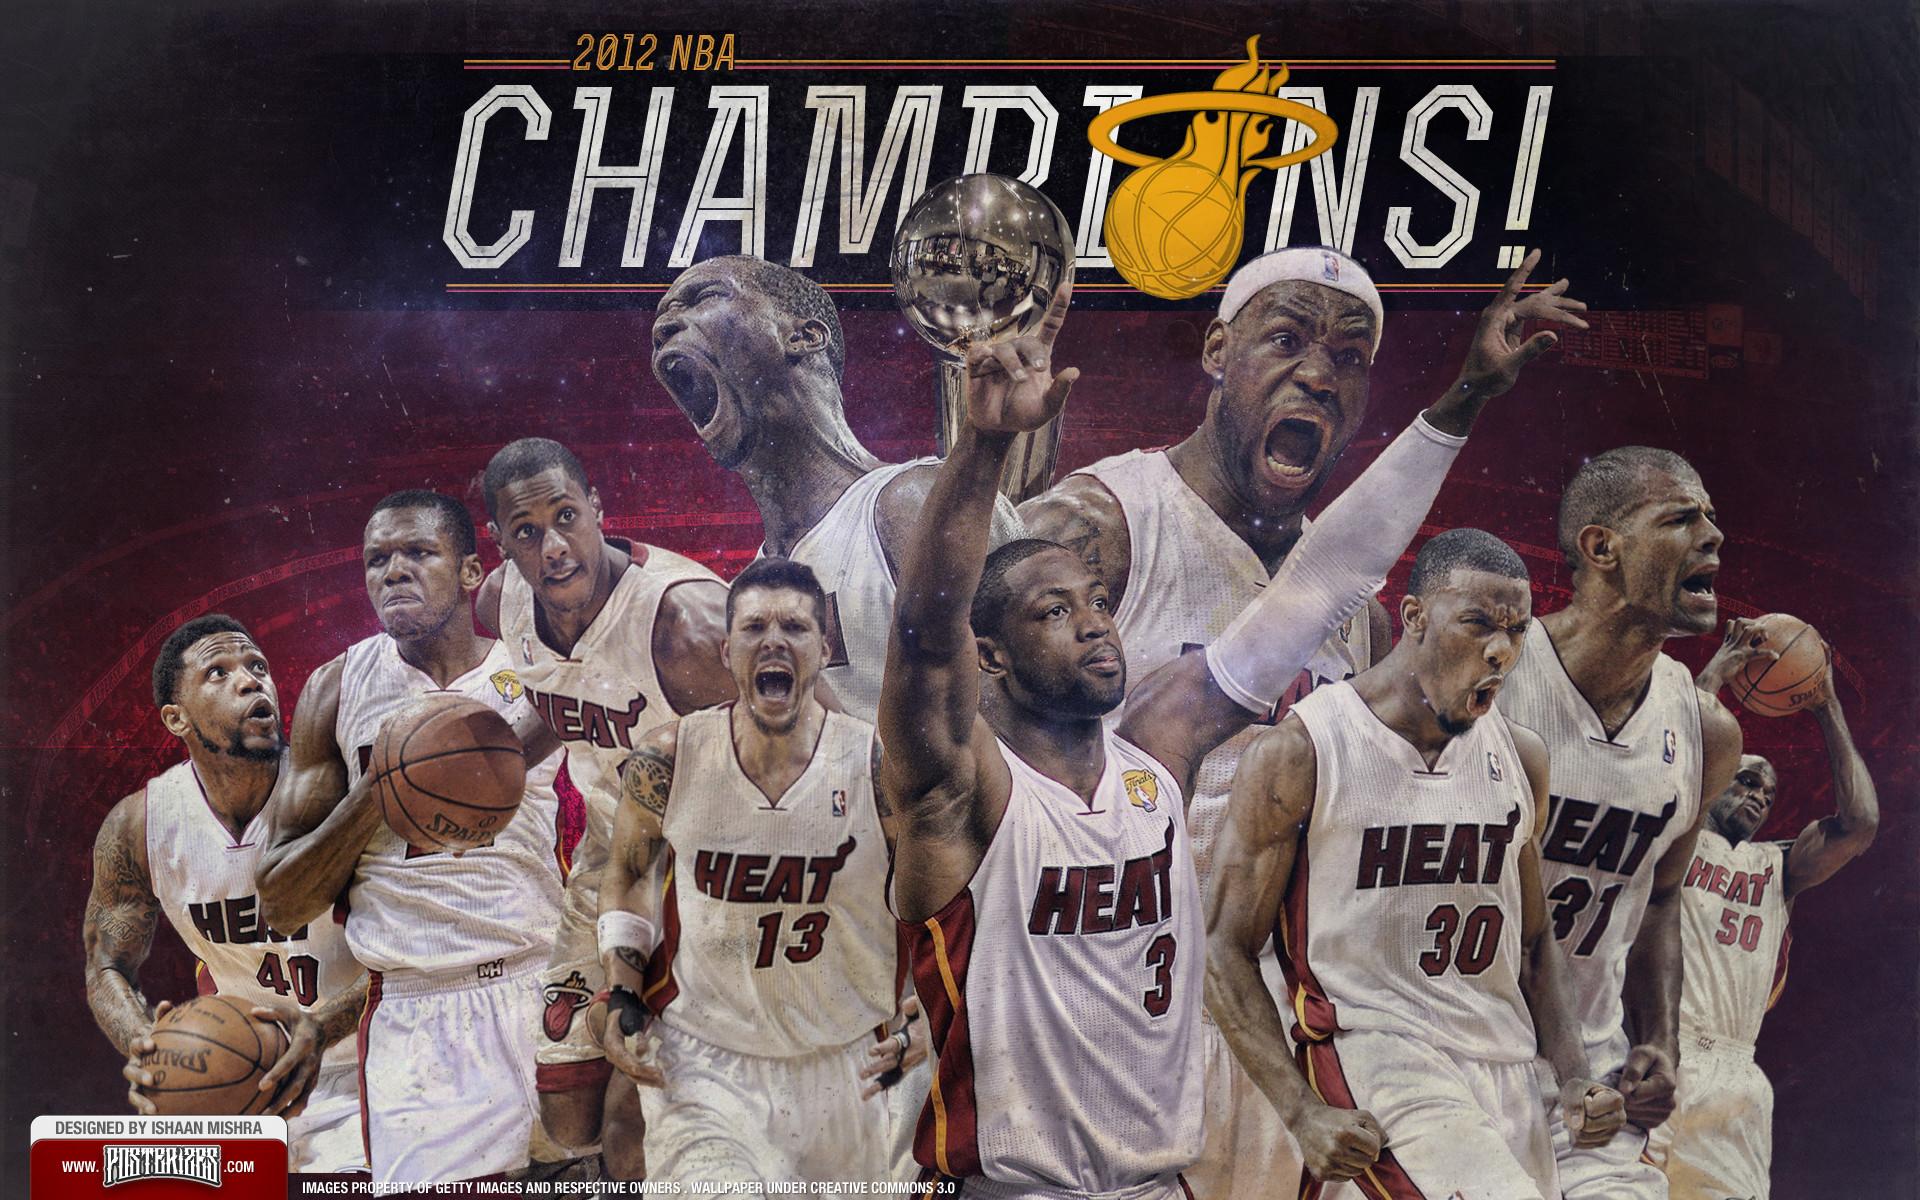 Miami Heat 2012 Champions Team Wallpaper by IshaanMishra on DeviantArt